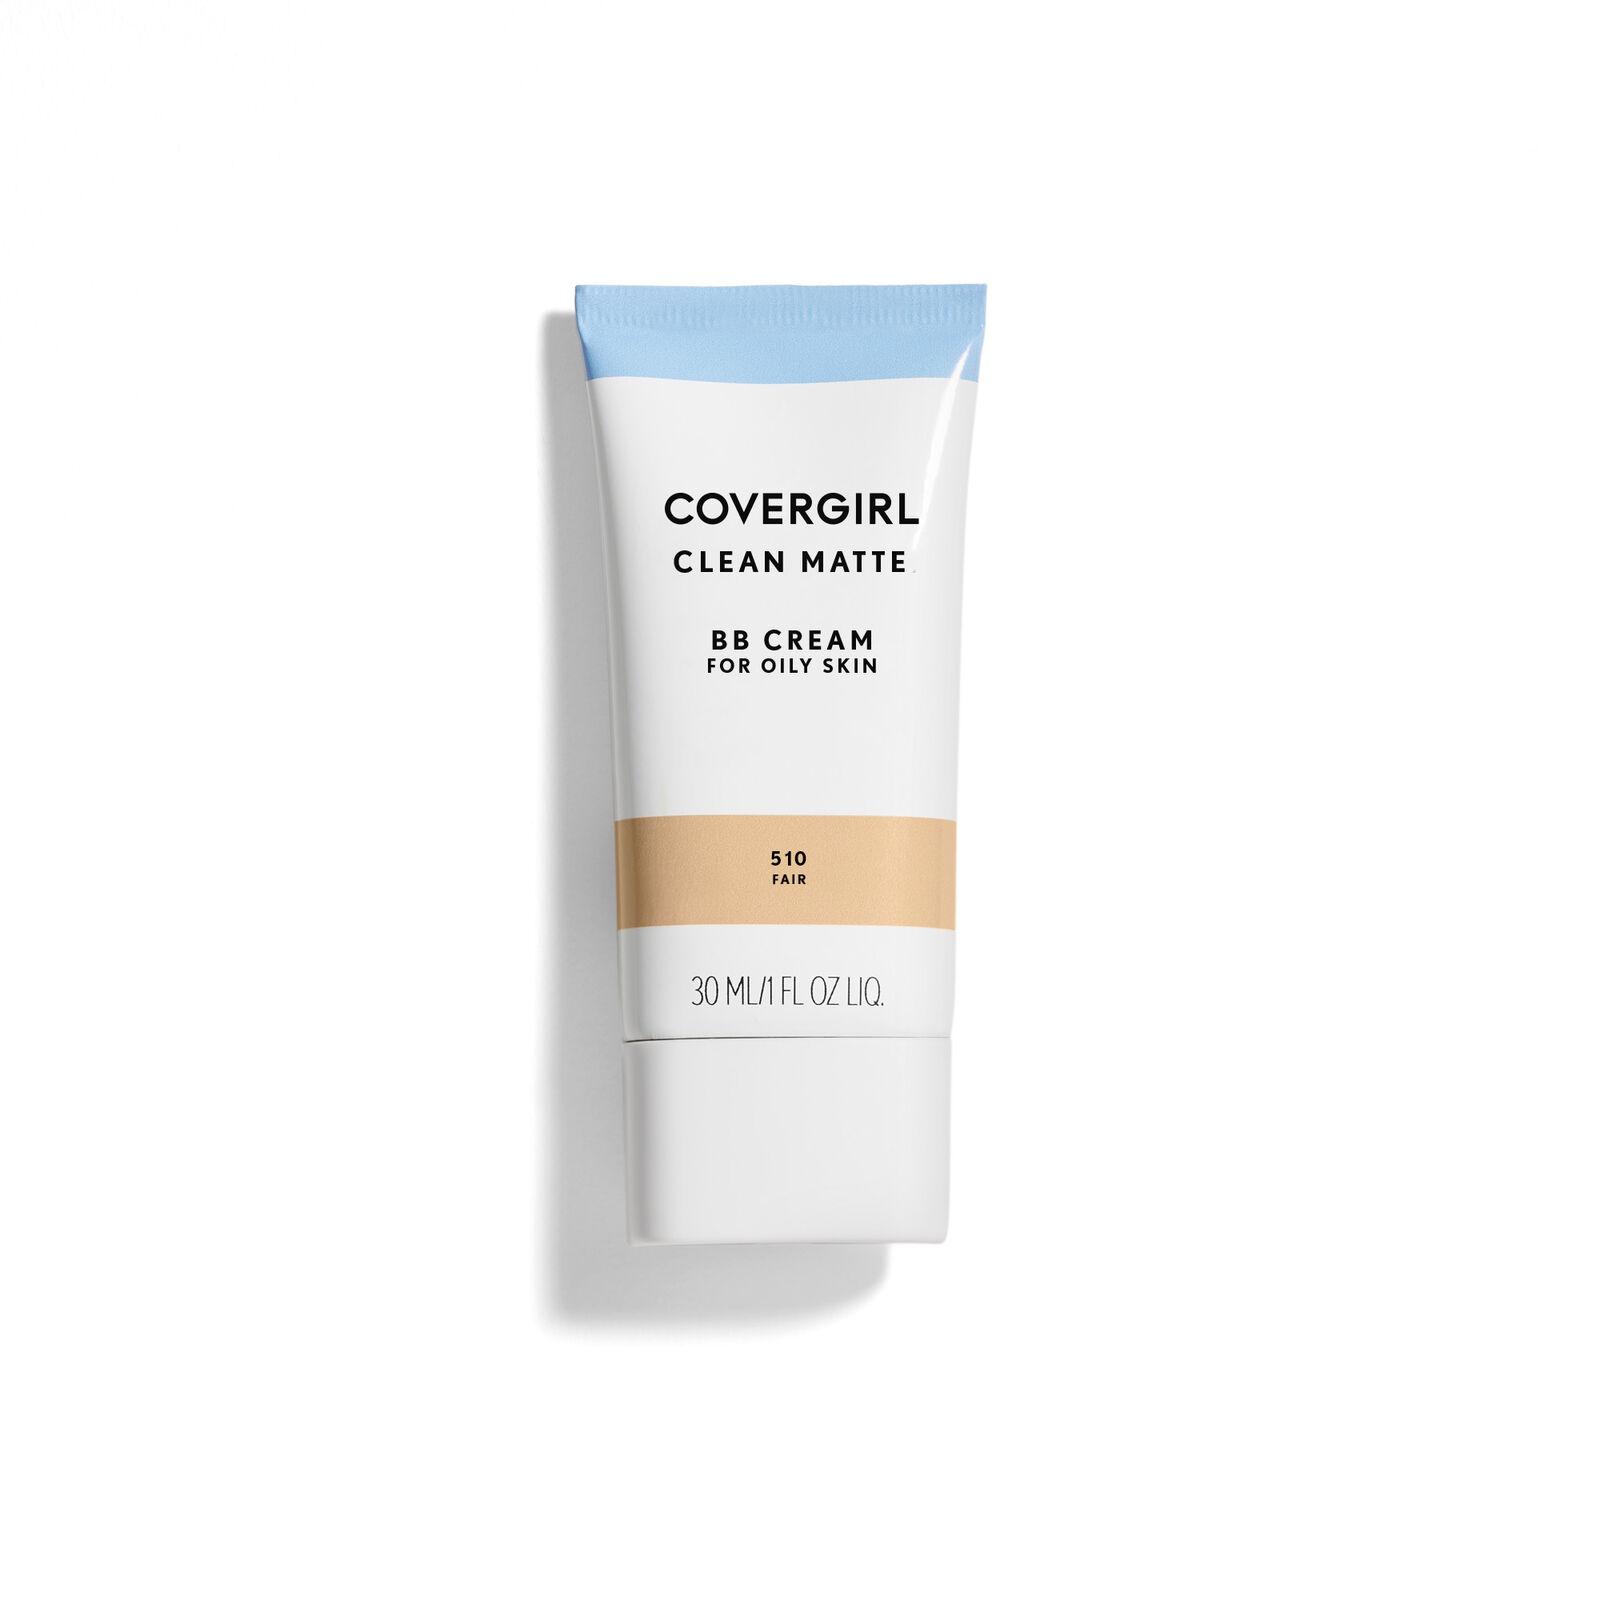 Clean Matte BB Cream – Covergirl.